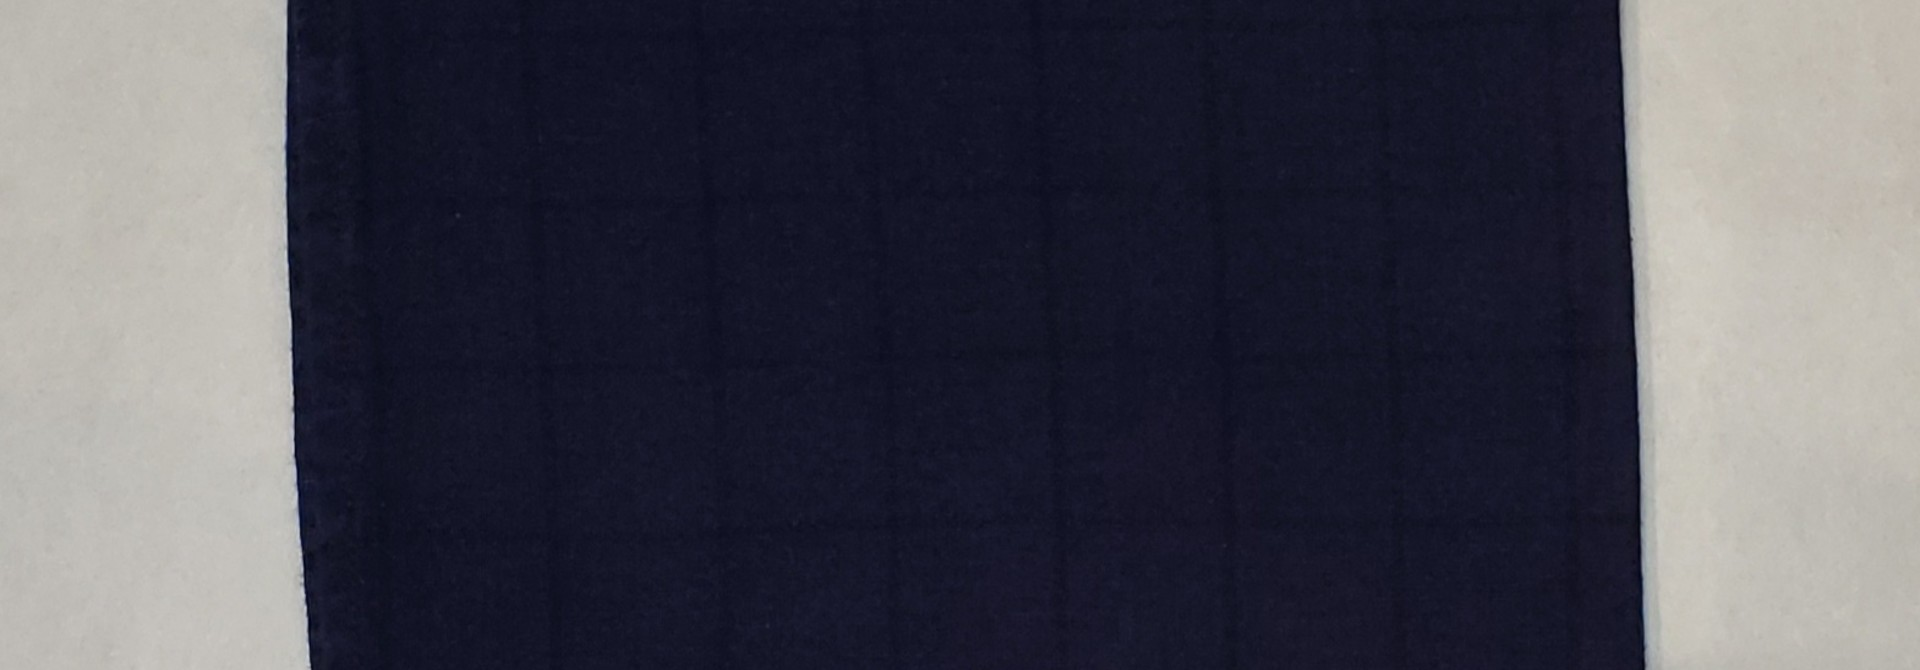 Tea Towel - Chieti - Indigo